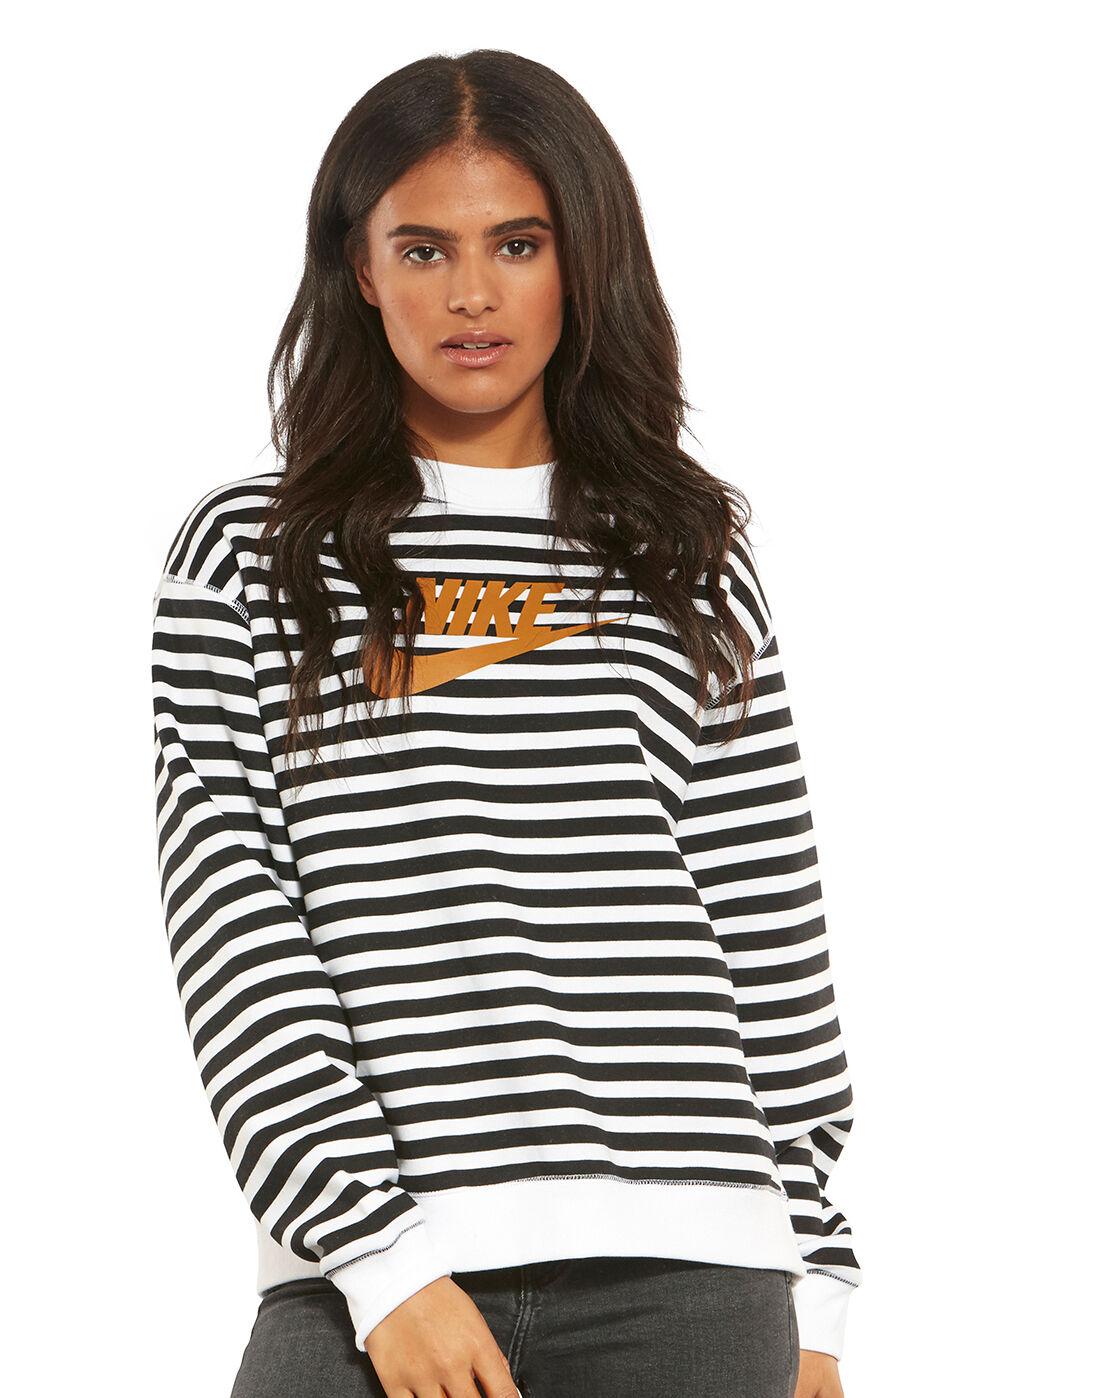 Women's Black & White Stripe Nike Sweatshirt   Life Style Sports